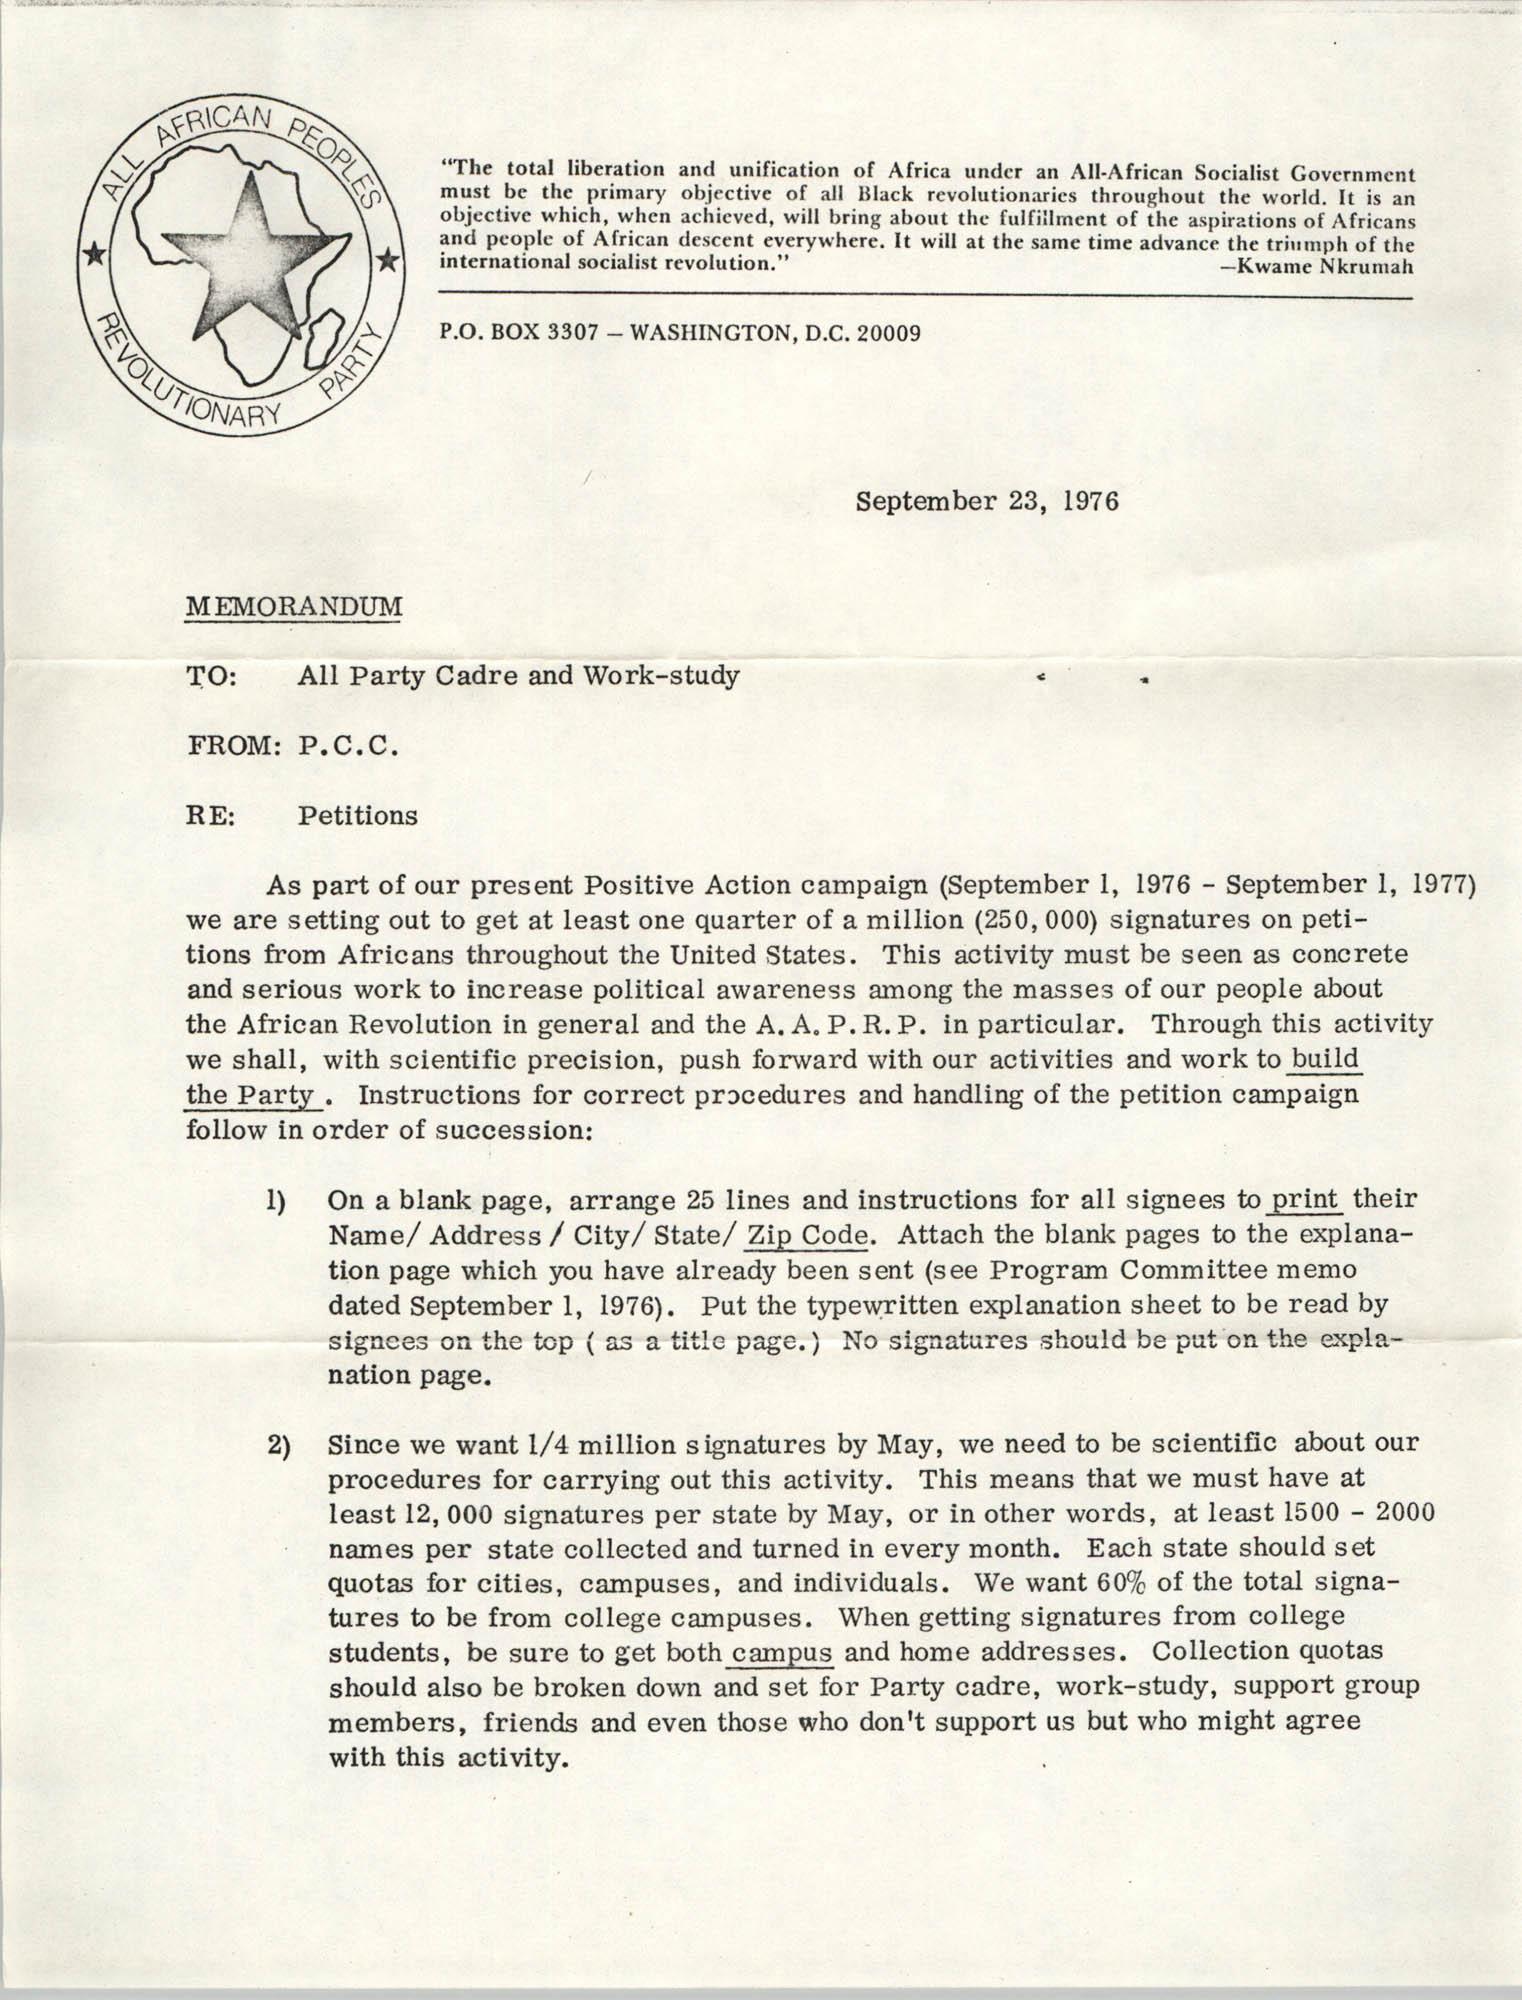 All African People's Revolutionary Party Memorandum, September 23, 1976